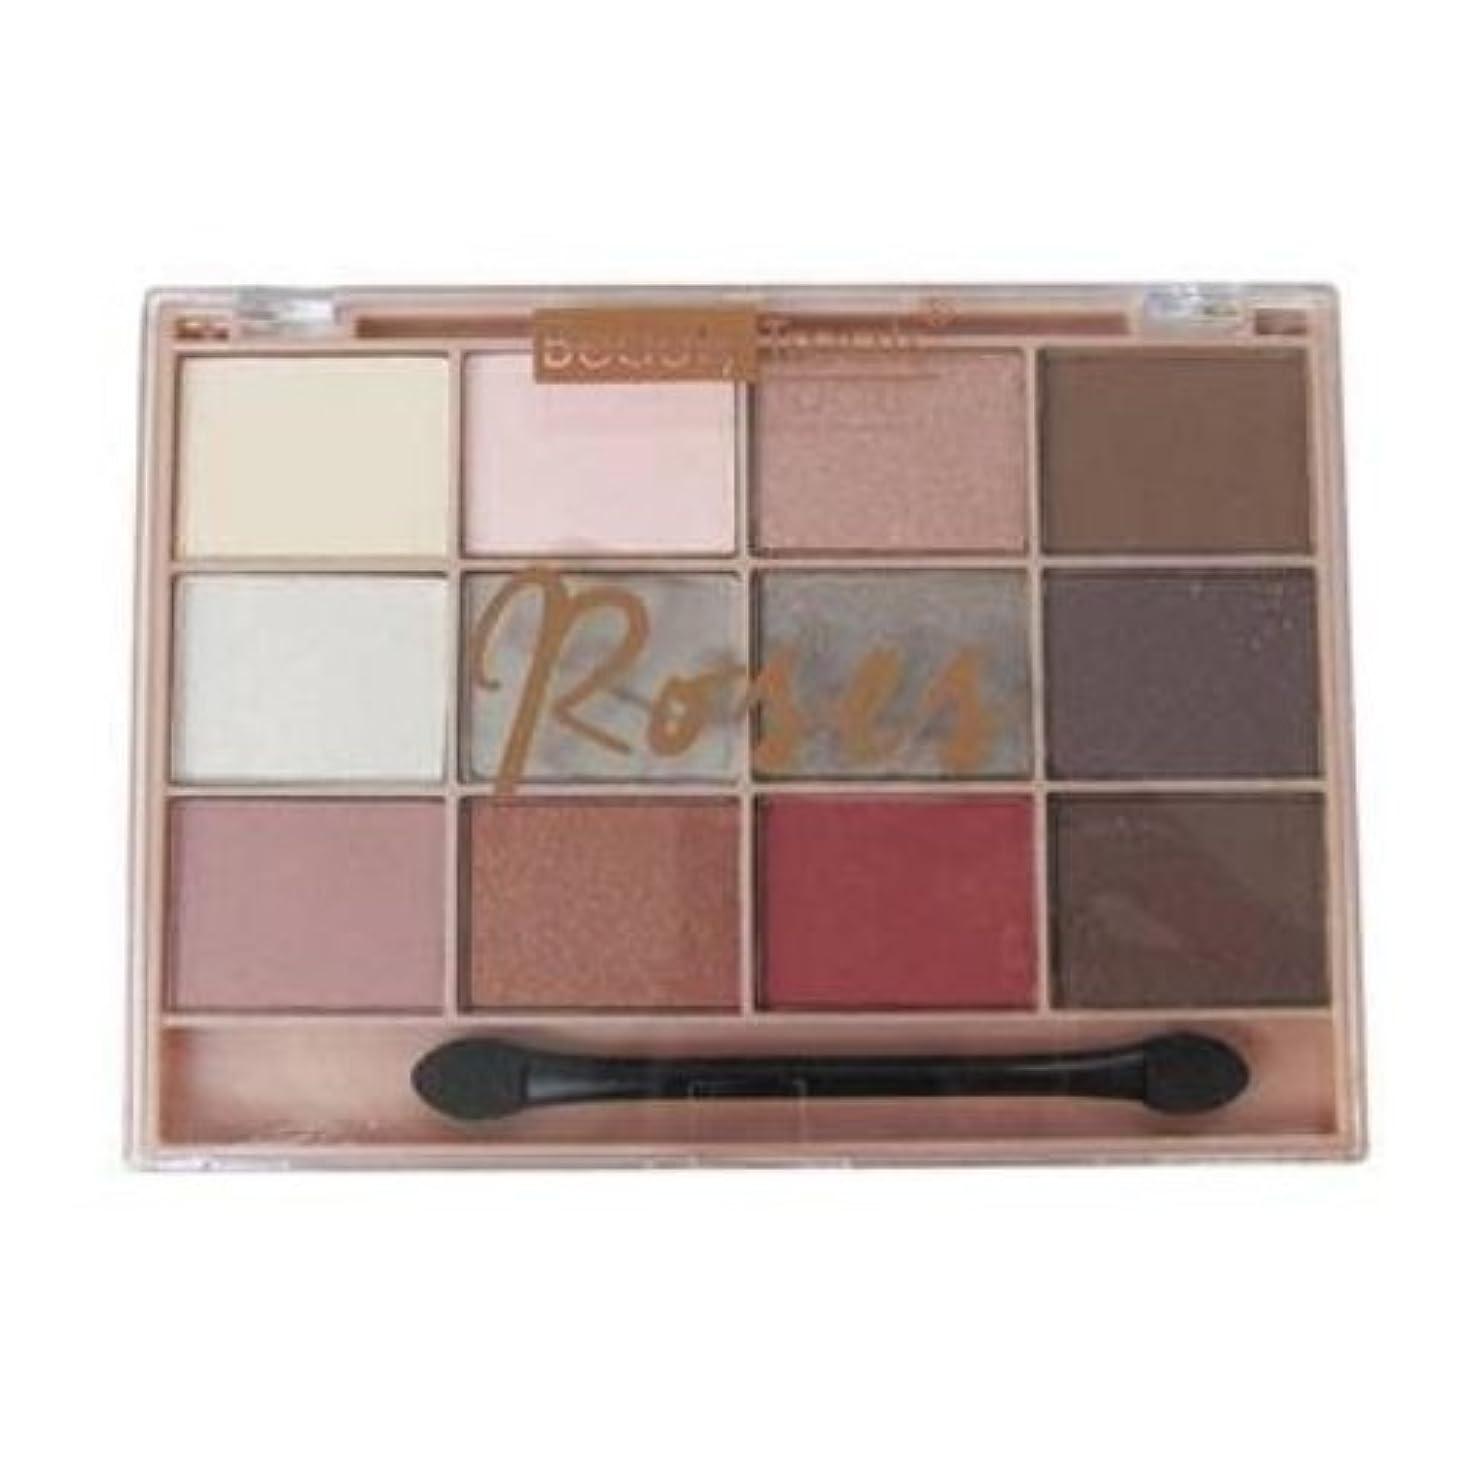 運搬桃神経障害BEAUTY TREATS Roses Eyeshadow Palette 1 (並行輸入品)